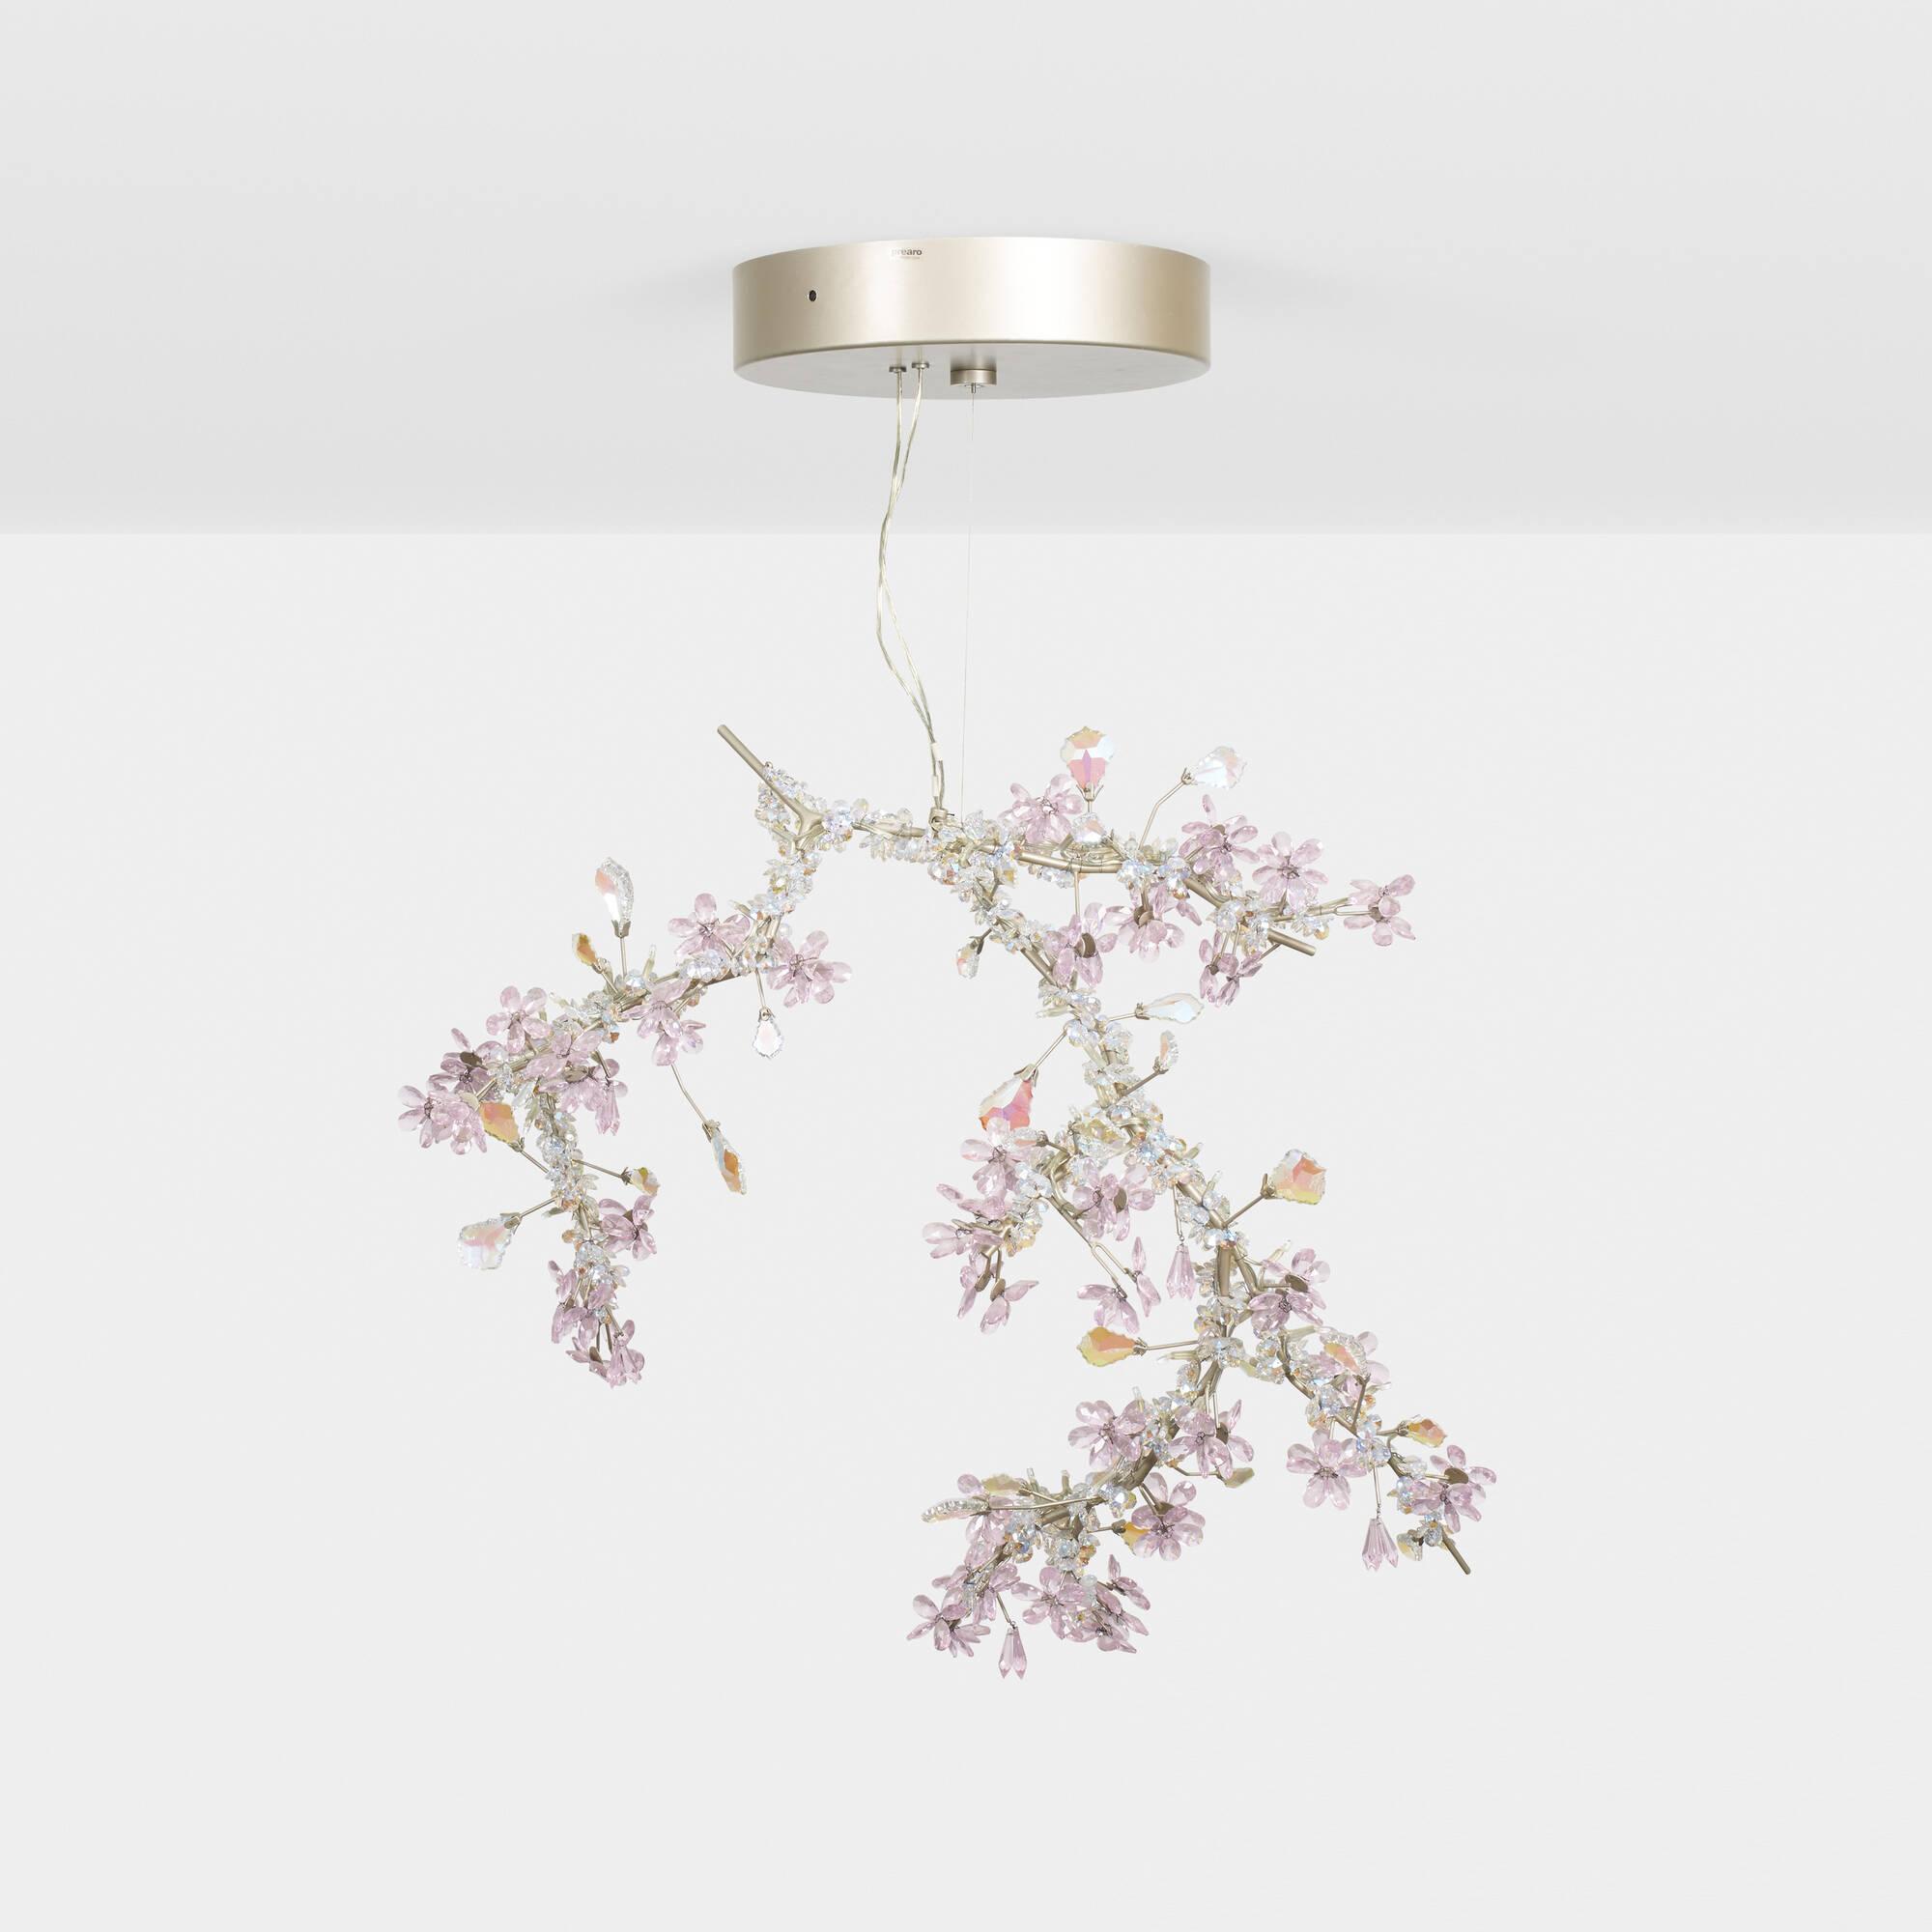 Tord Boontje Blossom Chandelier Designs